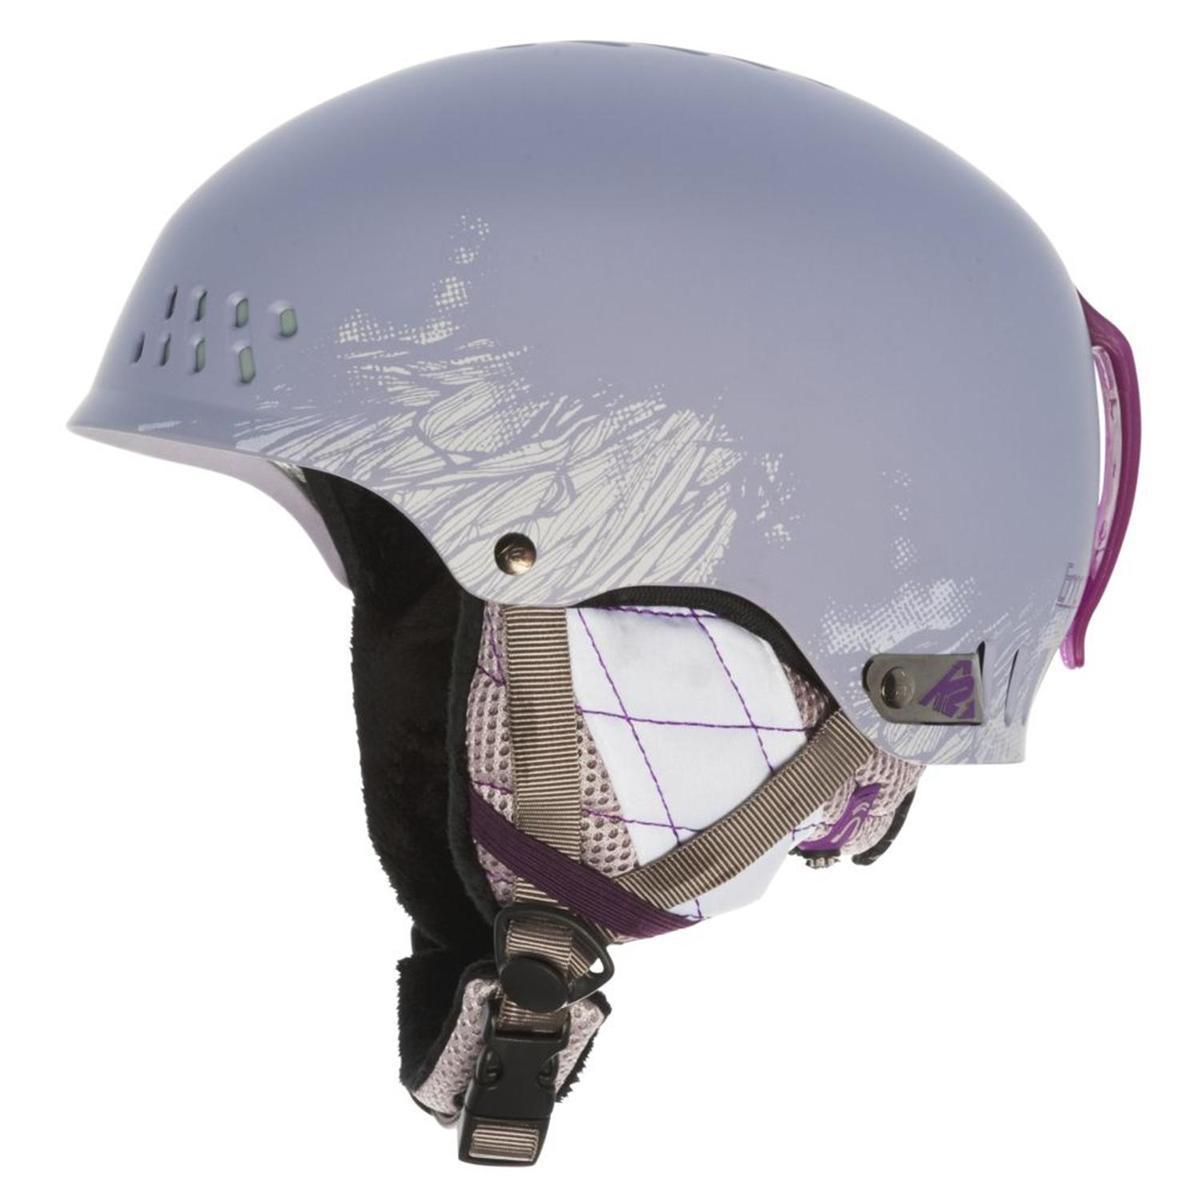 Kask K2 Emphasis jasny fioletowy